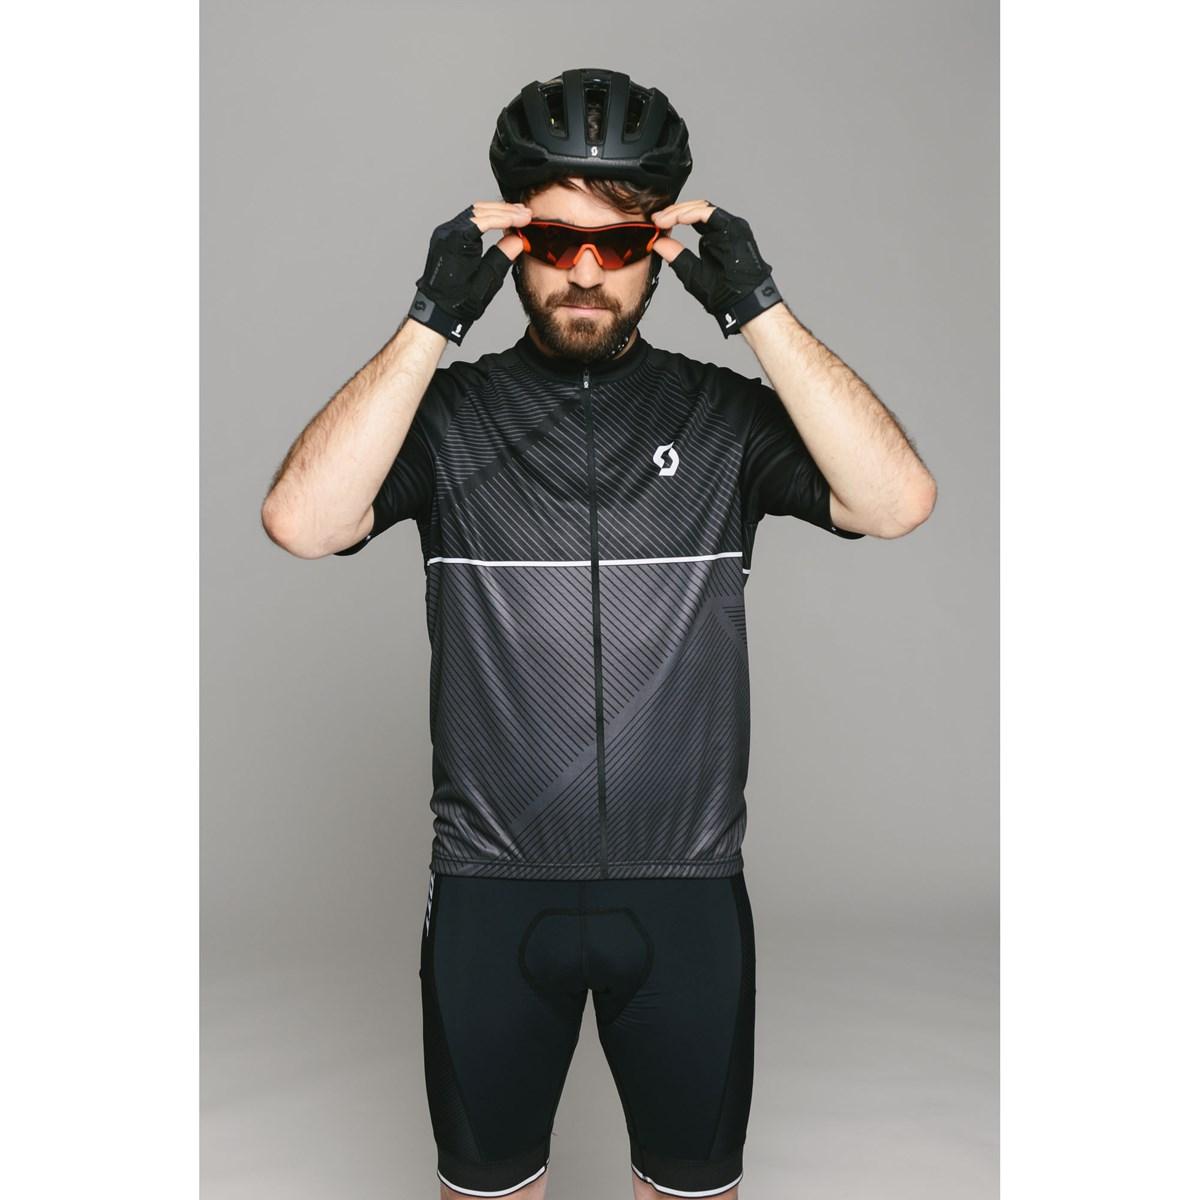 Scott Endurance 30 Short Sleeved Cycle Jersey Black £55.99 a53322ad6